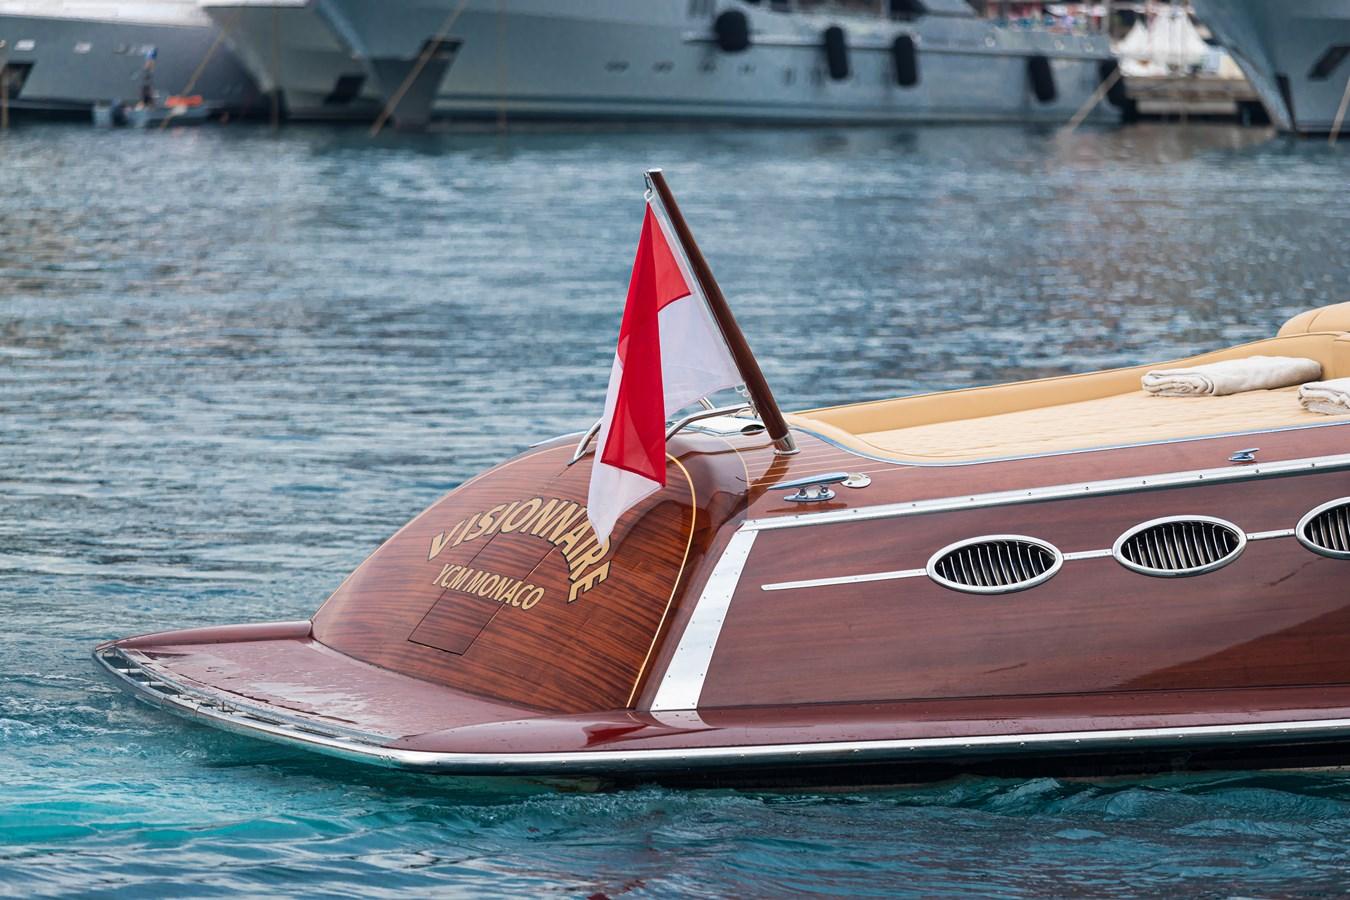 3 2010 J CRAFT Torpedo Motor Yacht 2673999